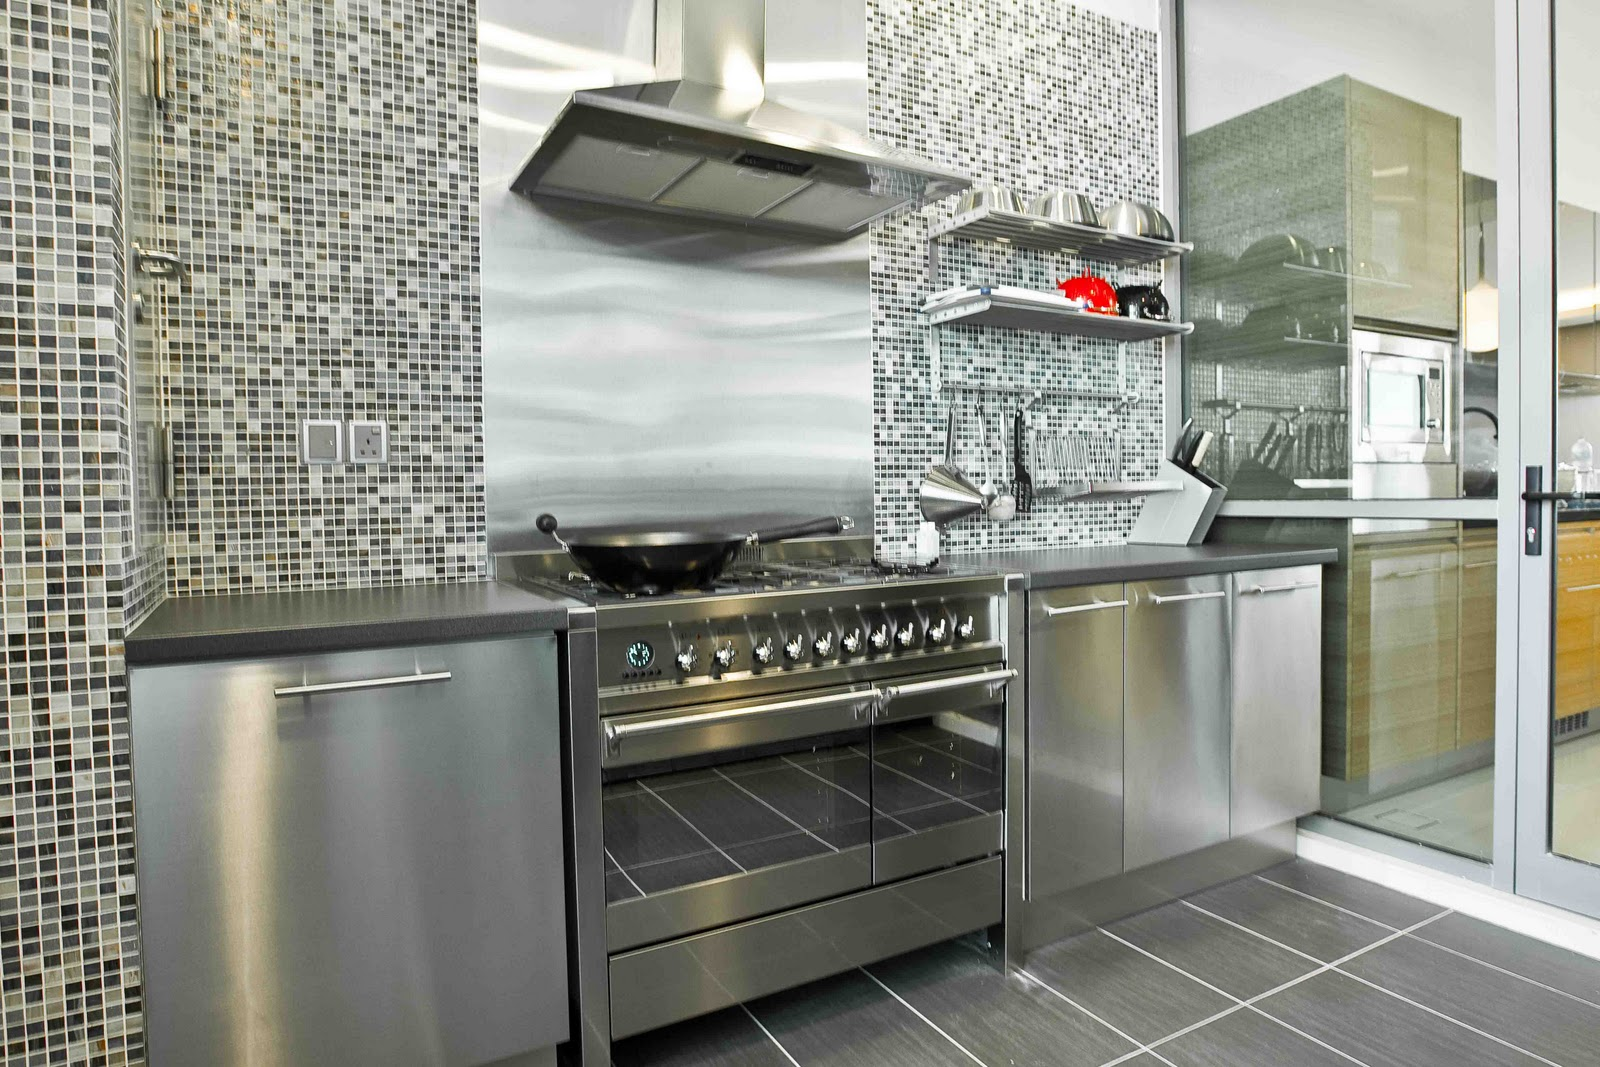 stainless steel kitchen shelves stainless steel kitchen cabinets Remarkable IKEA Kitchen Shelves Stainless Steel kB jpeg